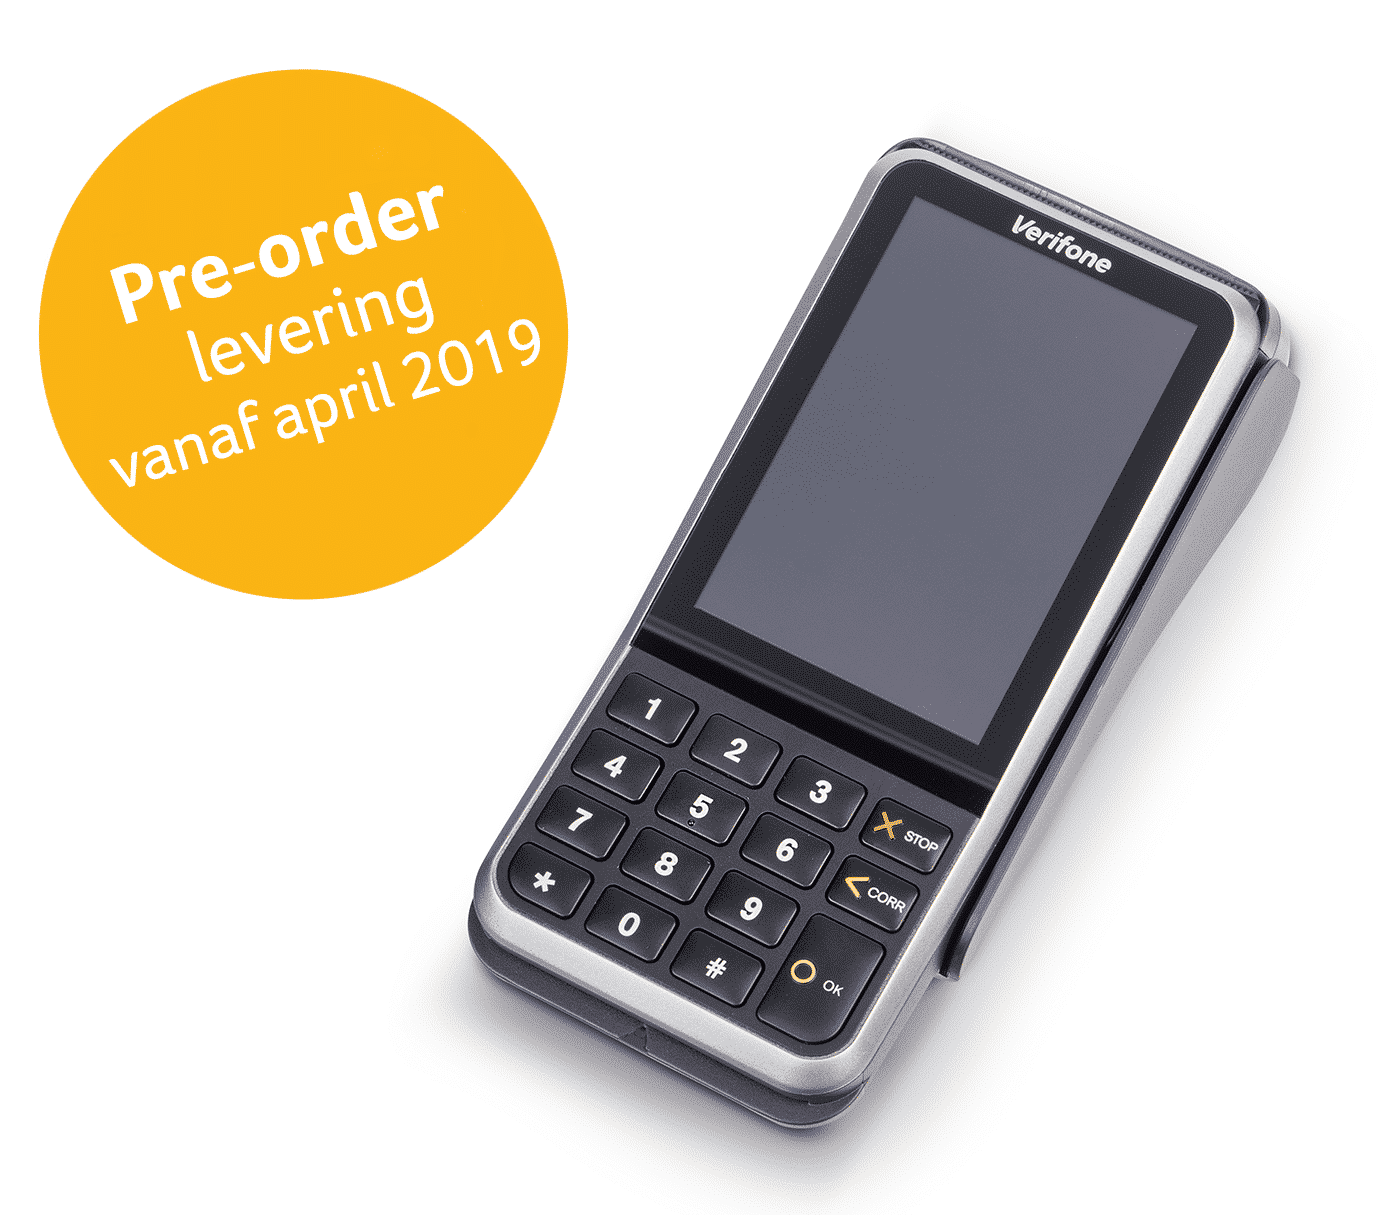 CCV Mobile - 400M pre-order